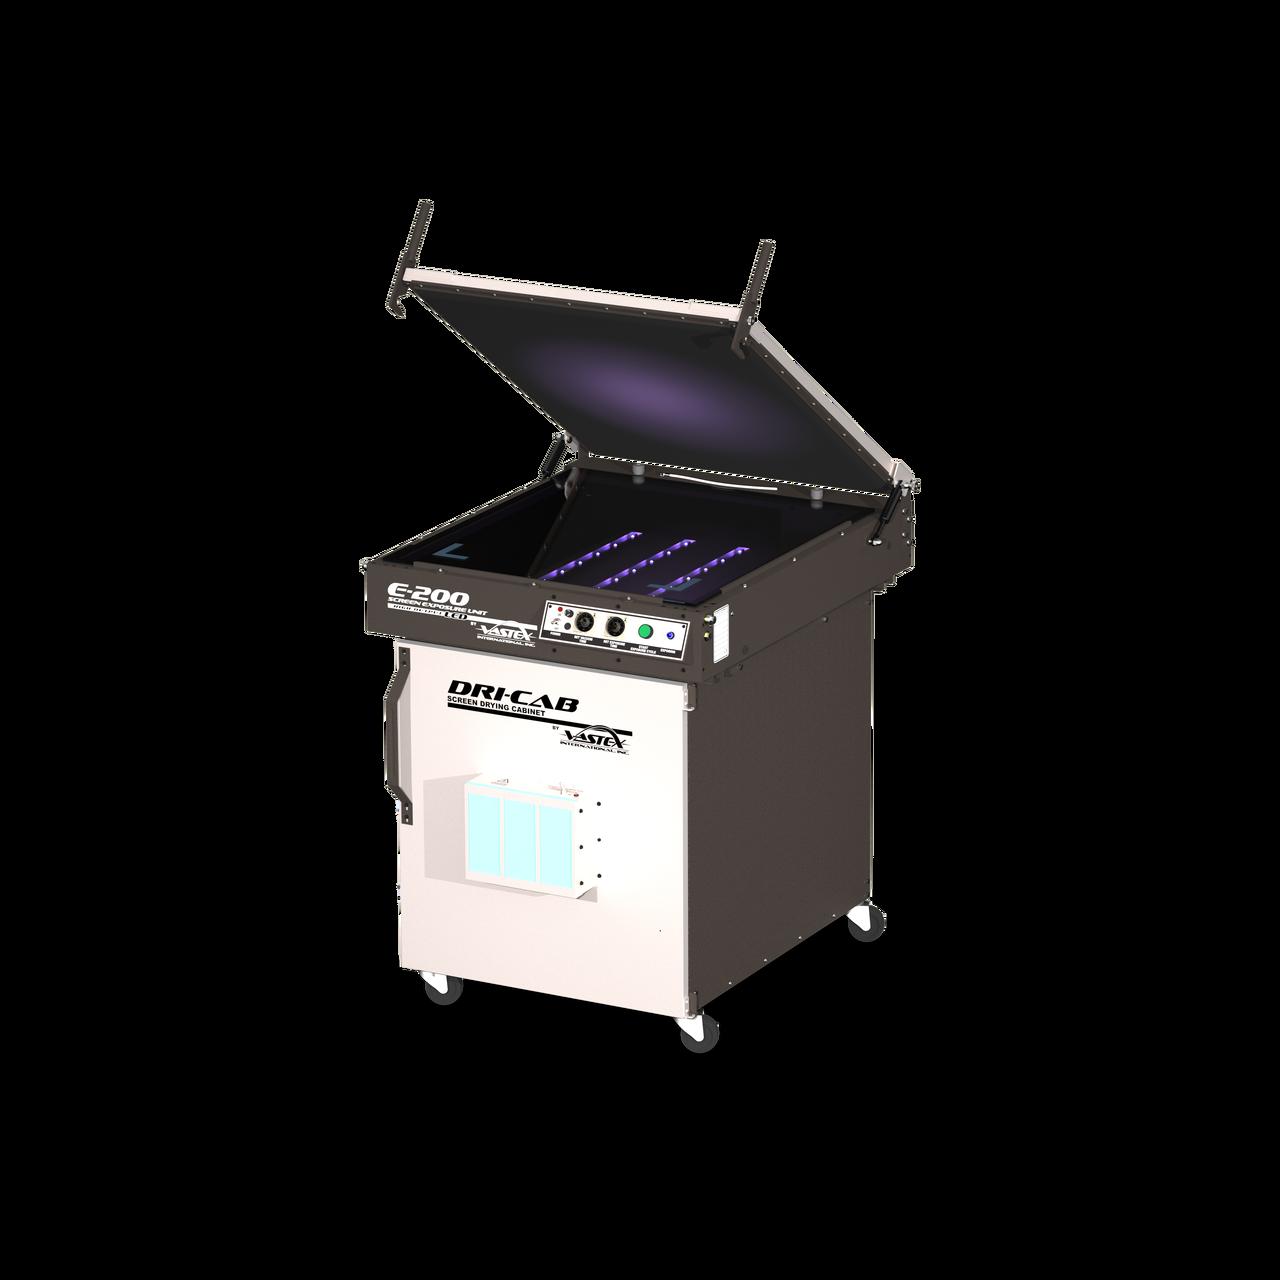 Vastex E-200 LED Screen Printing Exposure Unit